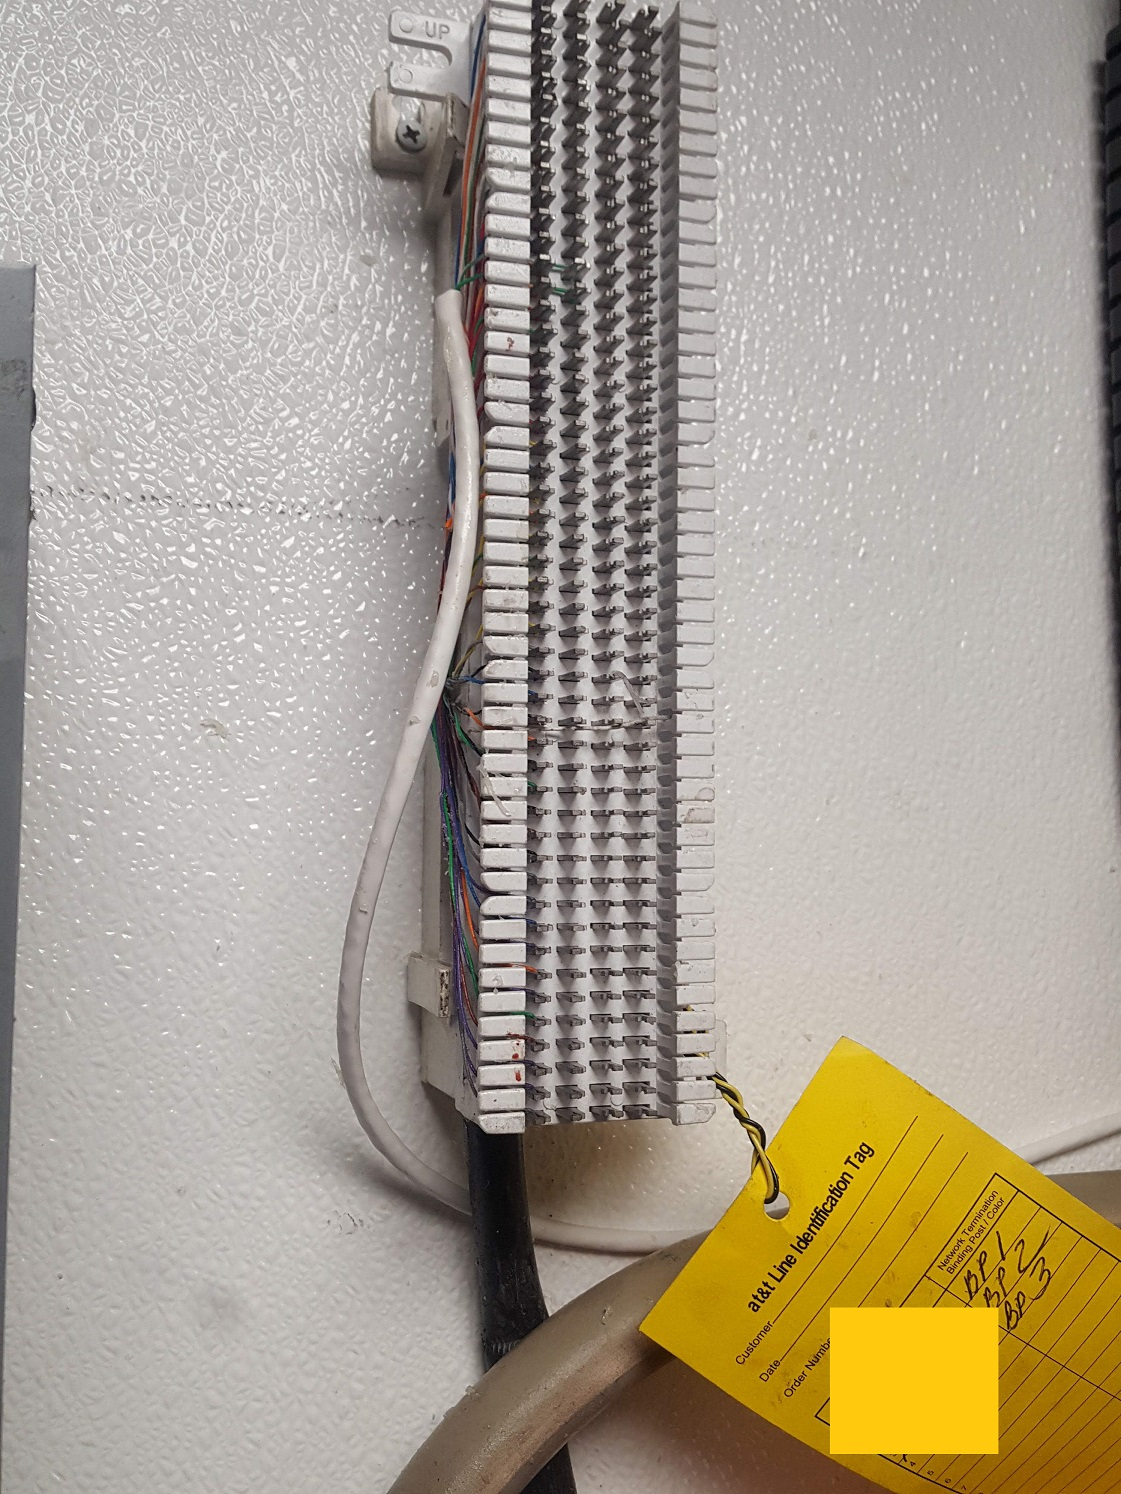 att install? - telephone system installers tech support communication  contractors  sundance communications